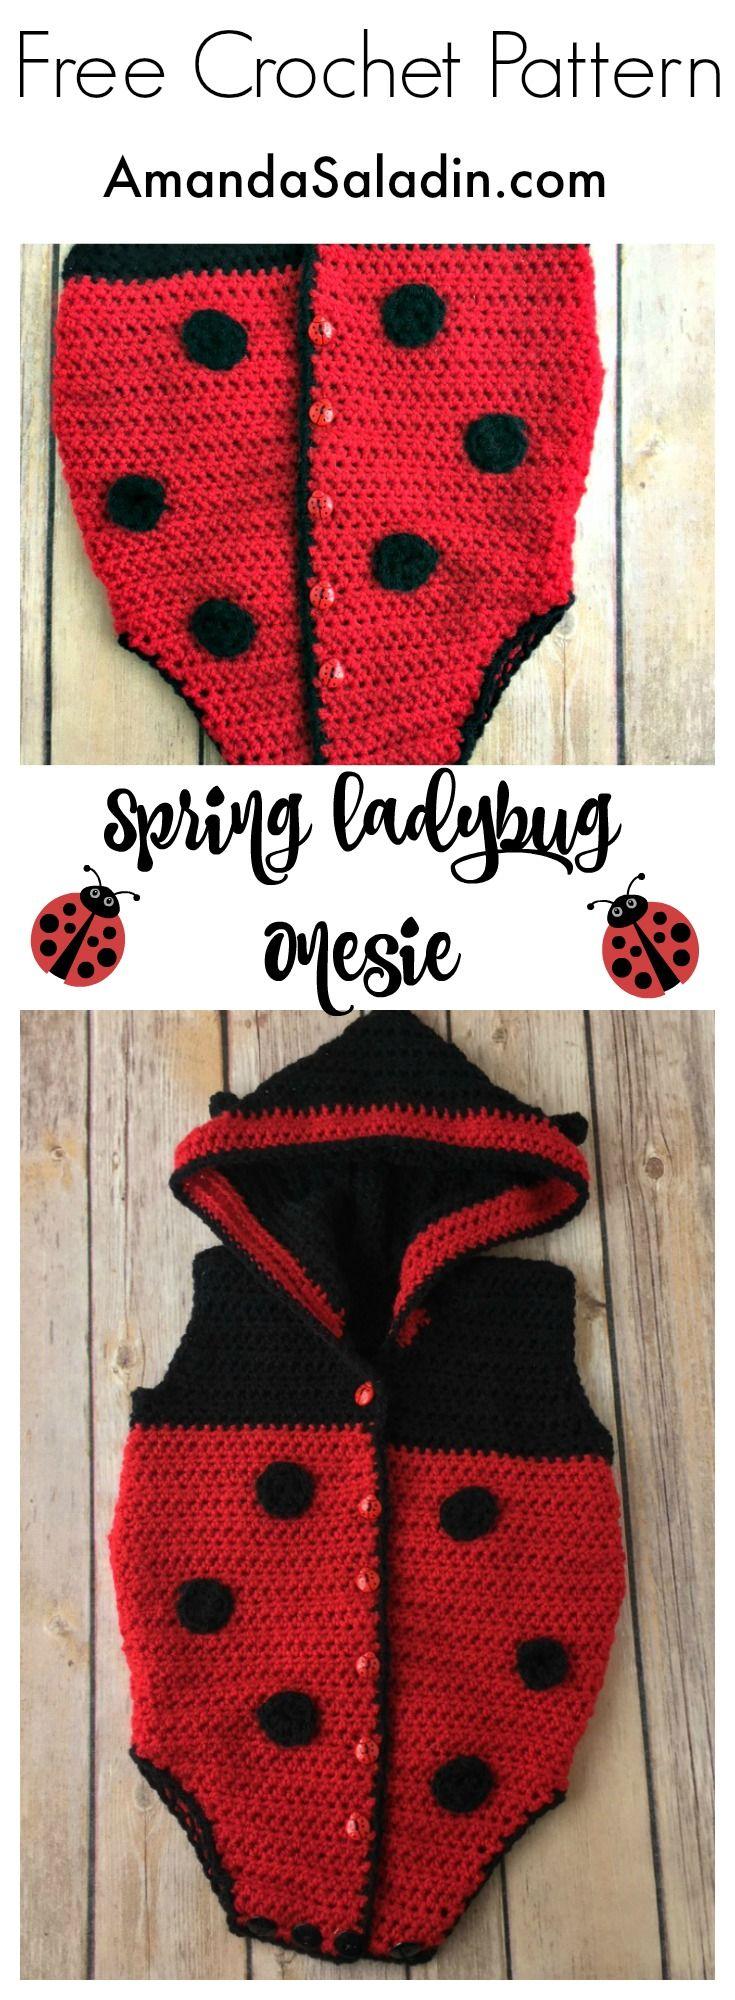 Best 25 crochet onesie ideas on pinterest crochet baby clothes spring ladybug onesie free crochet pattern bankloansurffo Gallery